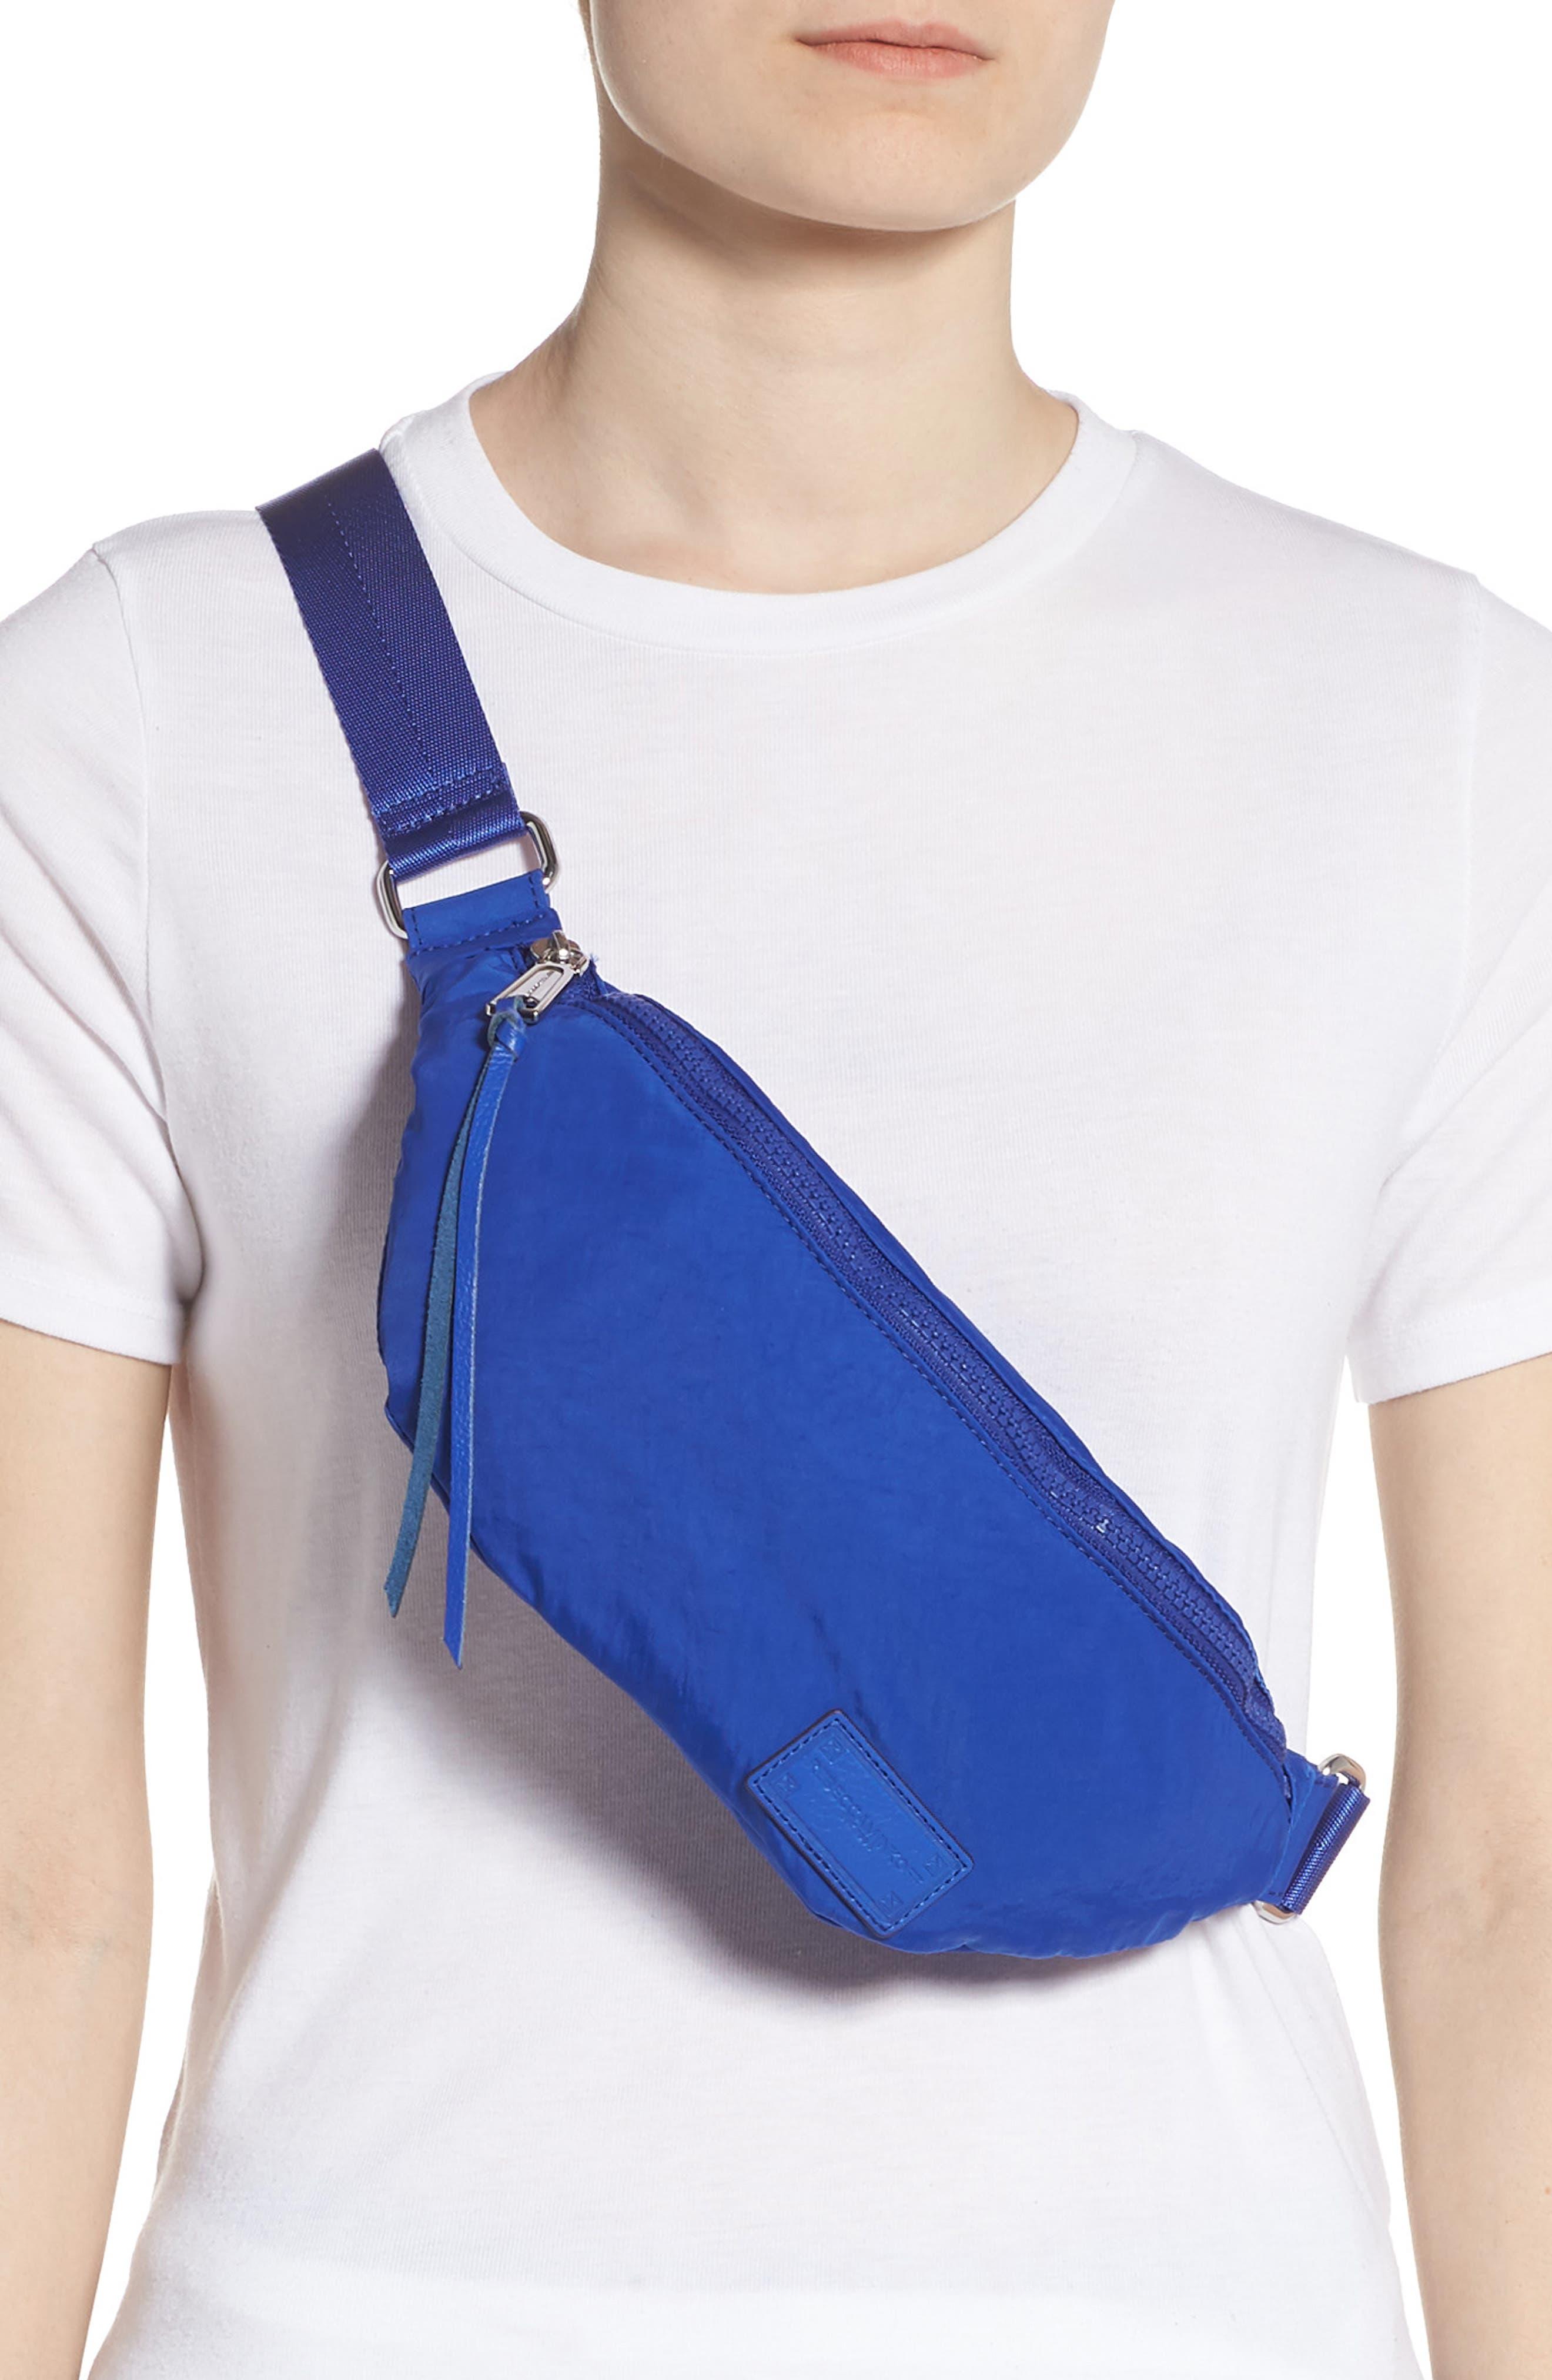 REBECCA MINKOFF, Nylon Belt Bag, Alternate thumbnail 4, color, BRIGHT BLUE